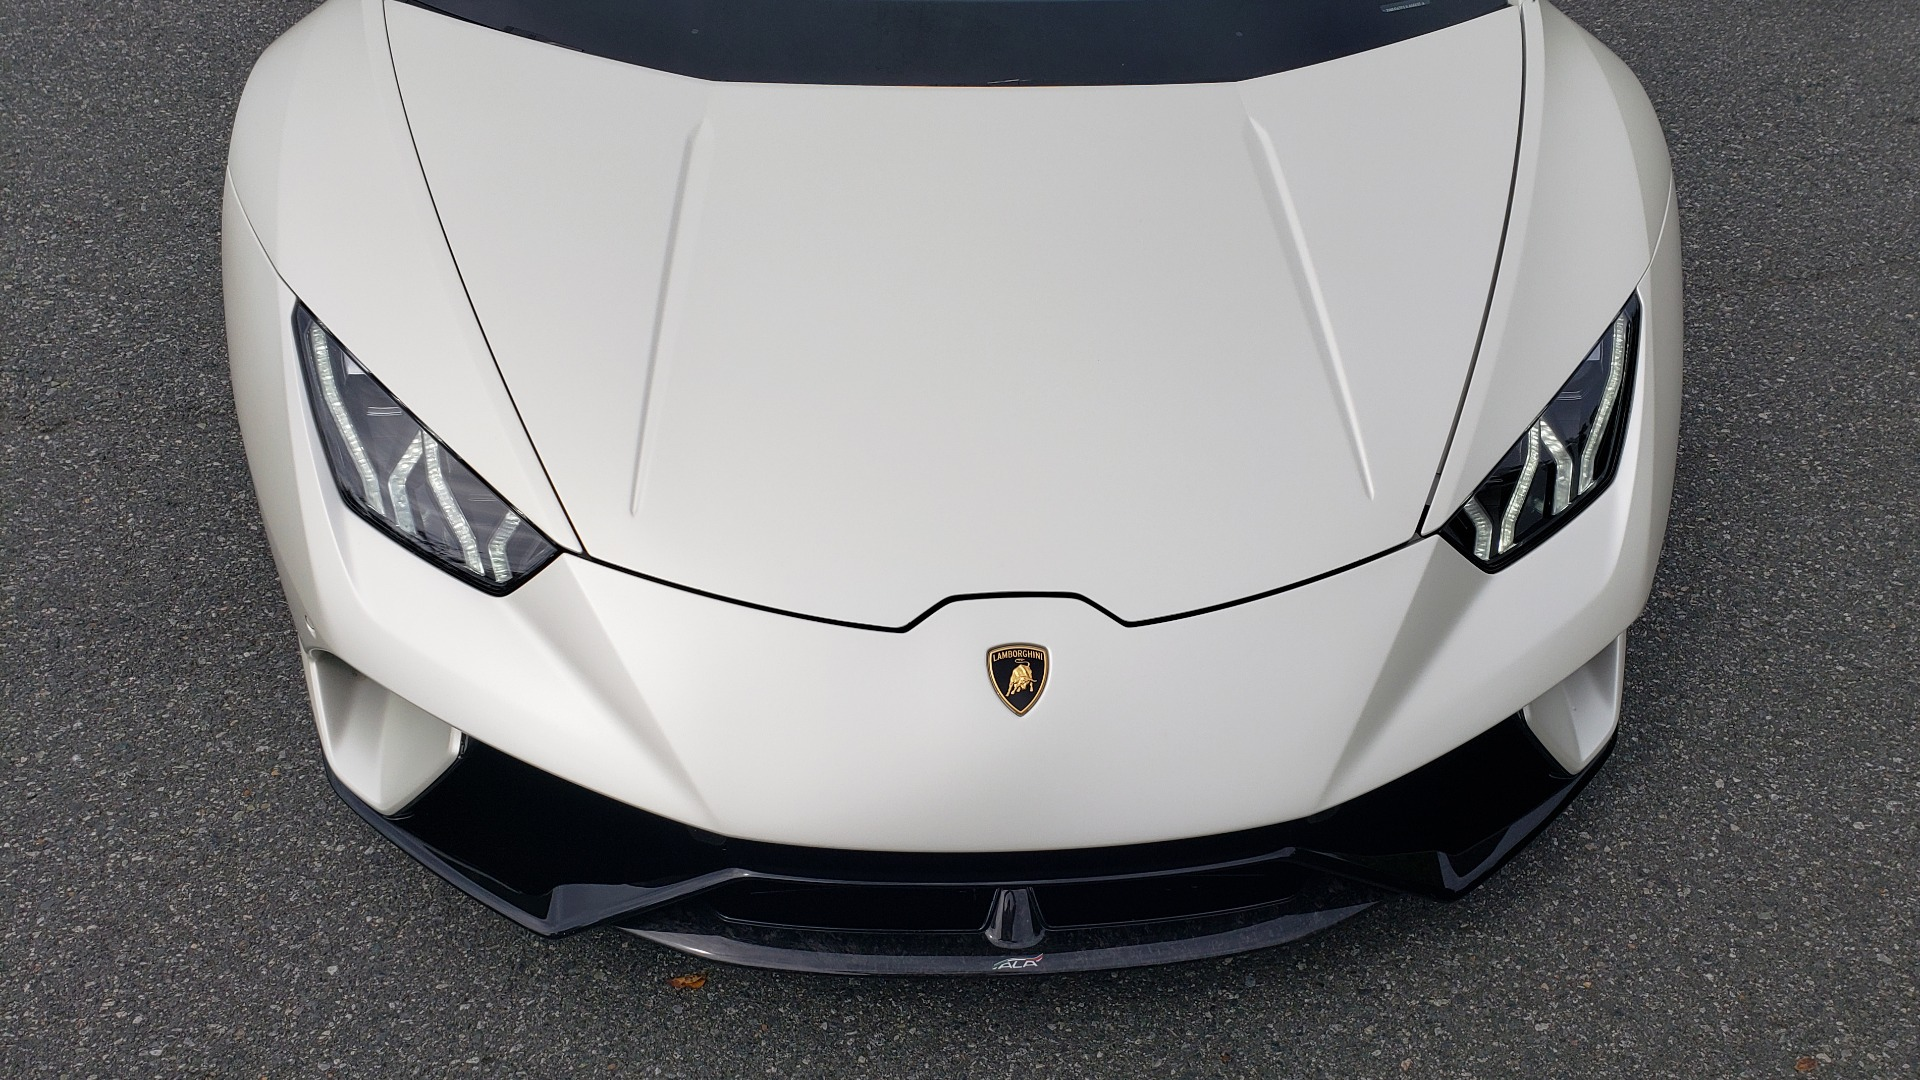 Used 2018 Lamborghini HURACAN PERFORMANTE 5.2L V10 / 630HP / 7-SPD AUTO / AWD / NAV / PREM SND for sale $269,995 at Formula Imports in Charlotte NC 28227 17